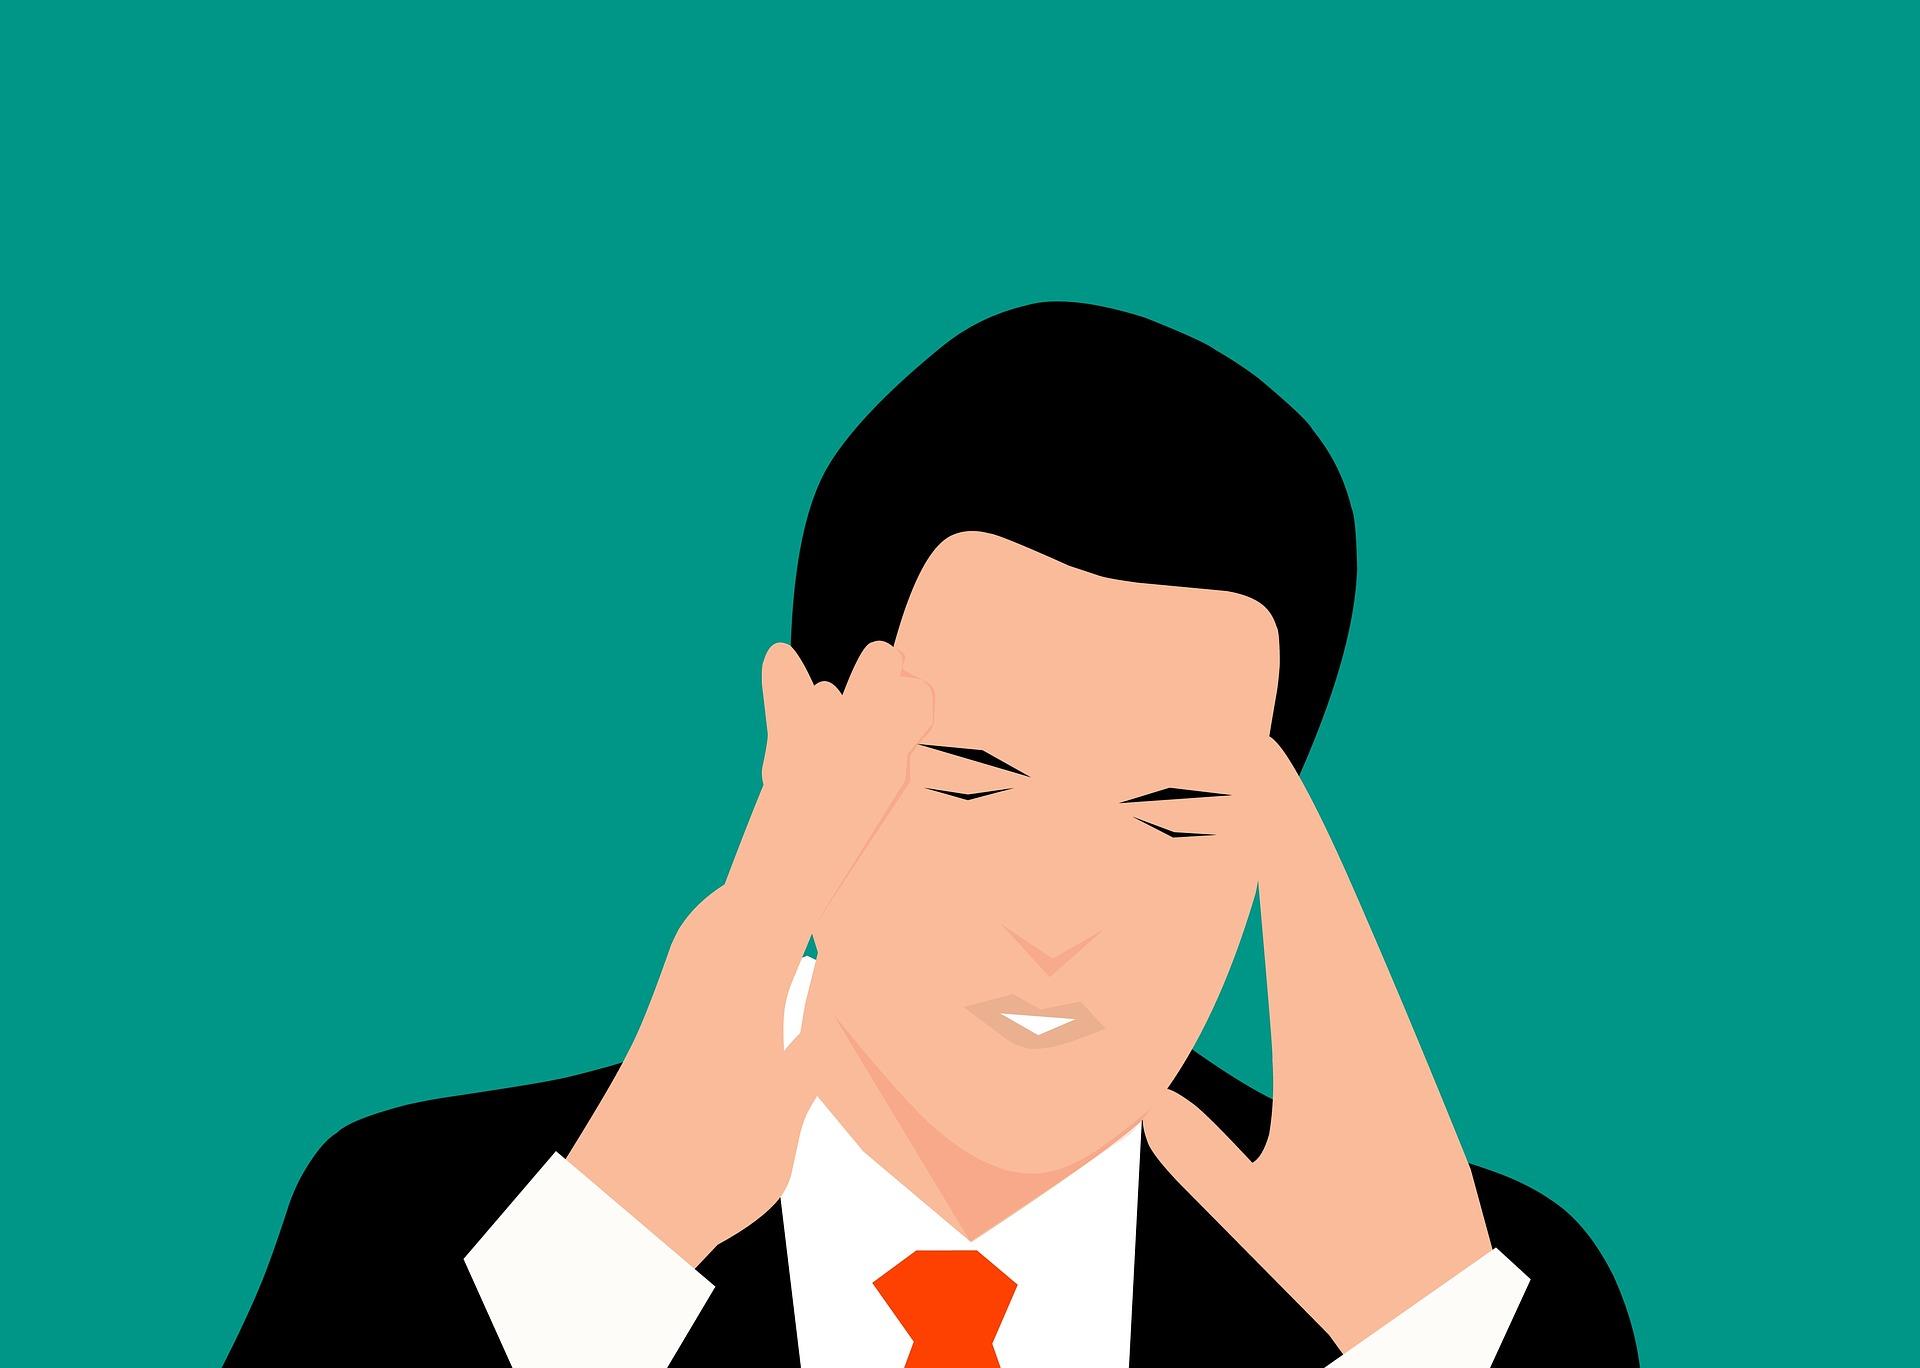 What is a vestibular migraine diagnostic criterion?